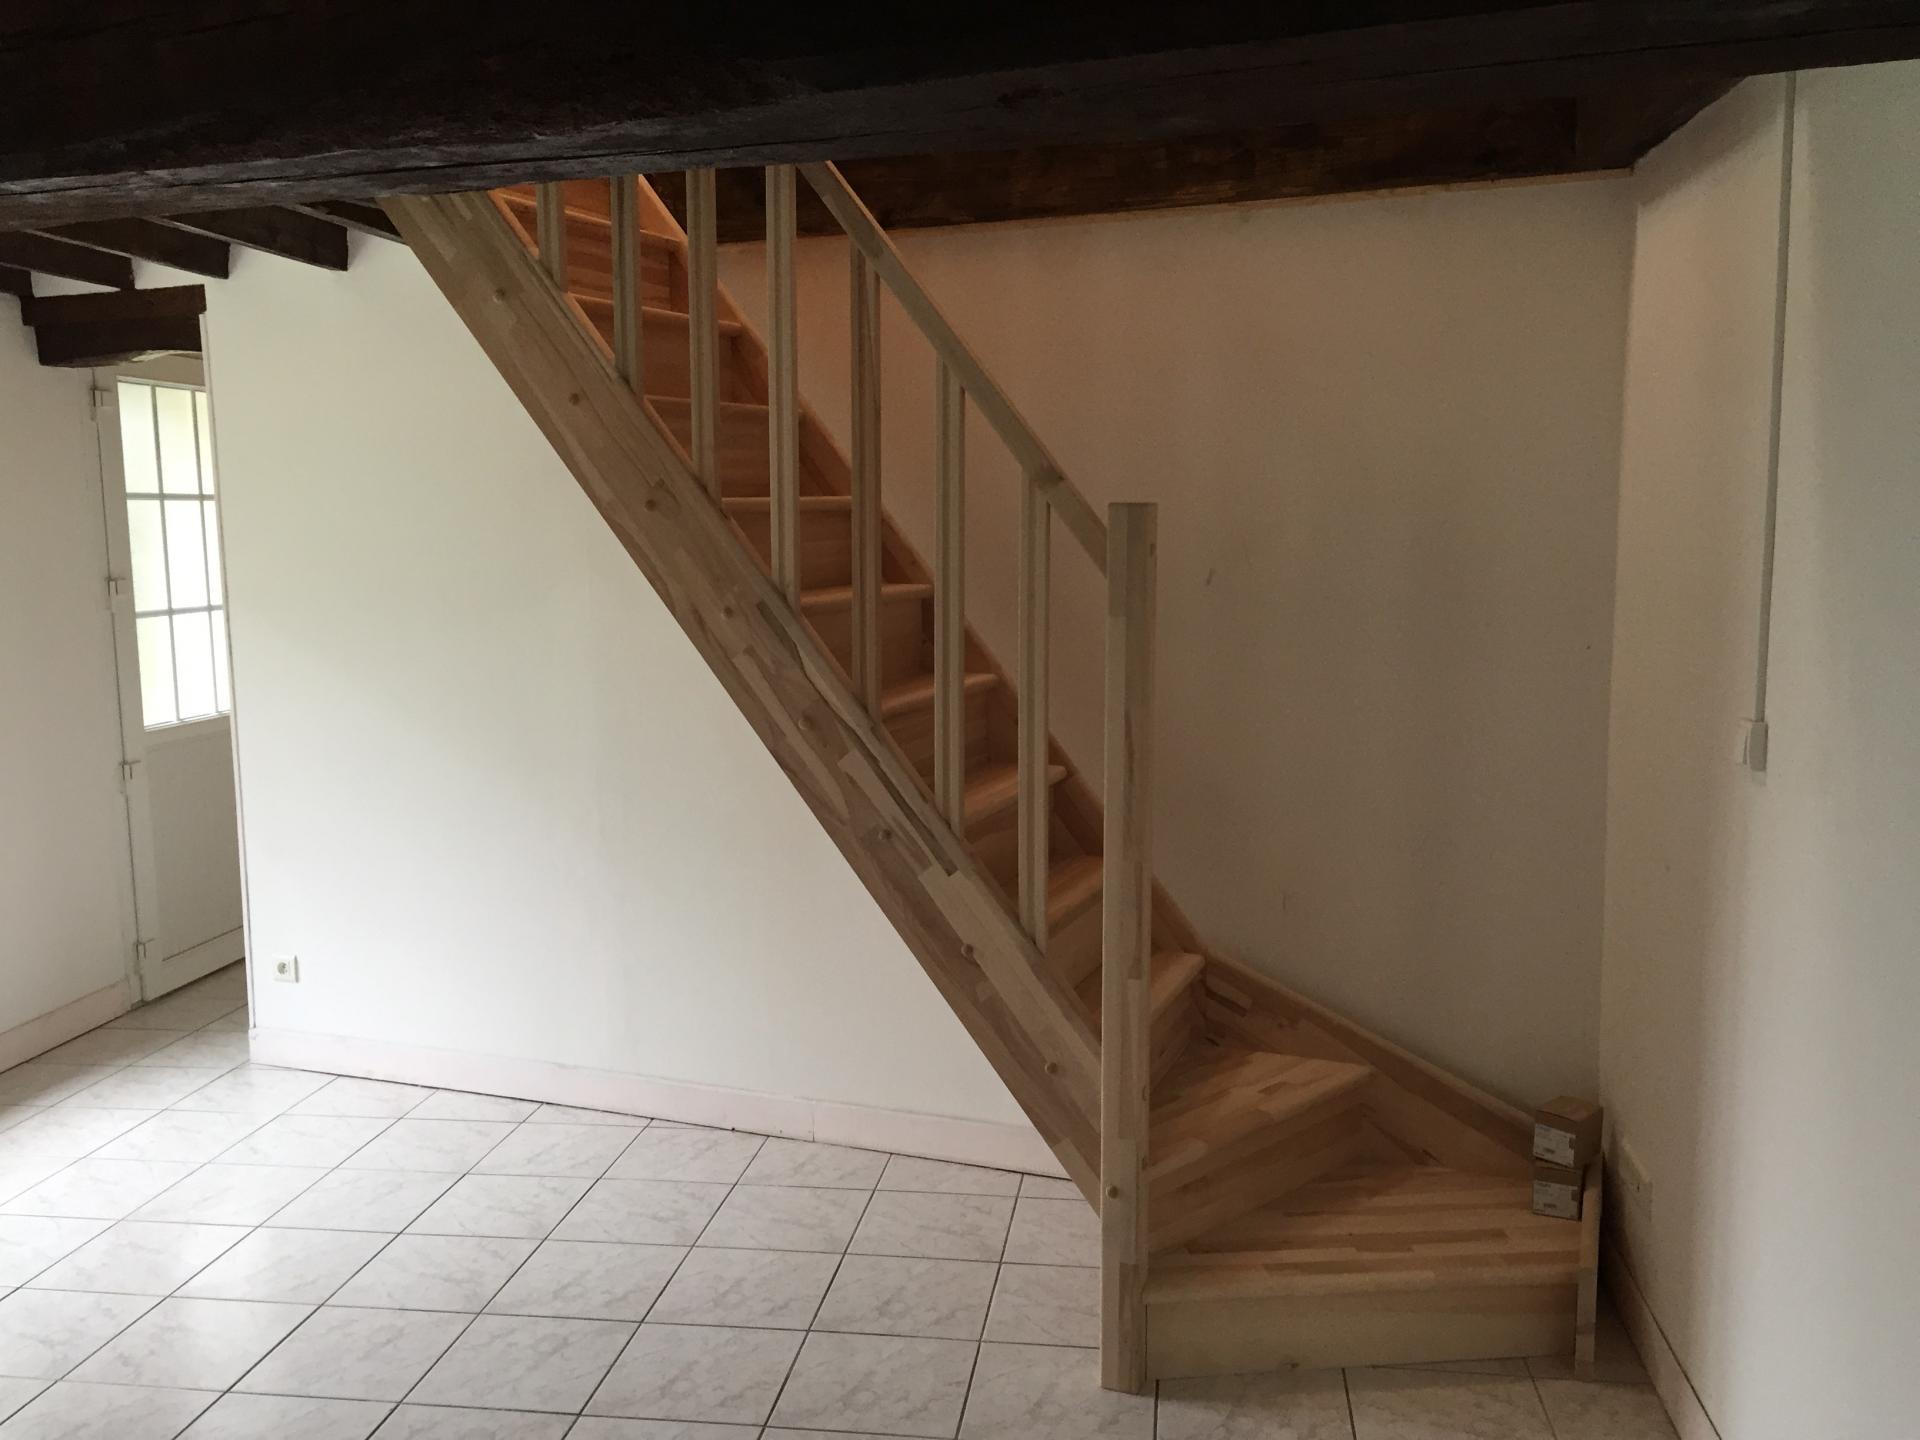 escalier acces combles escalier acces combles obasinc cr ation escalier colima on acc s aux. Black Bedroom Furniture Sets. Home Design Ideas